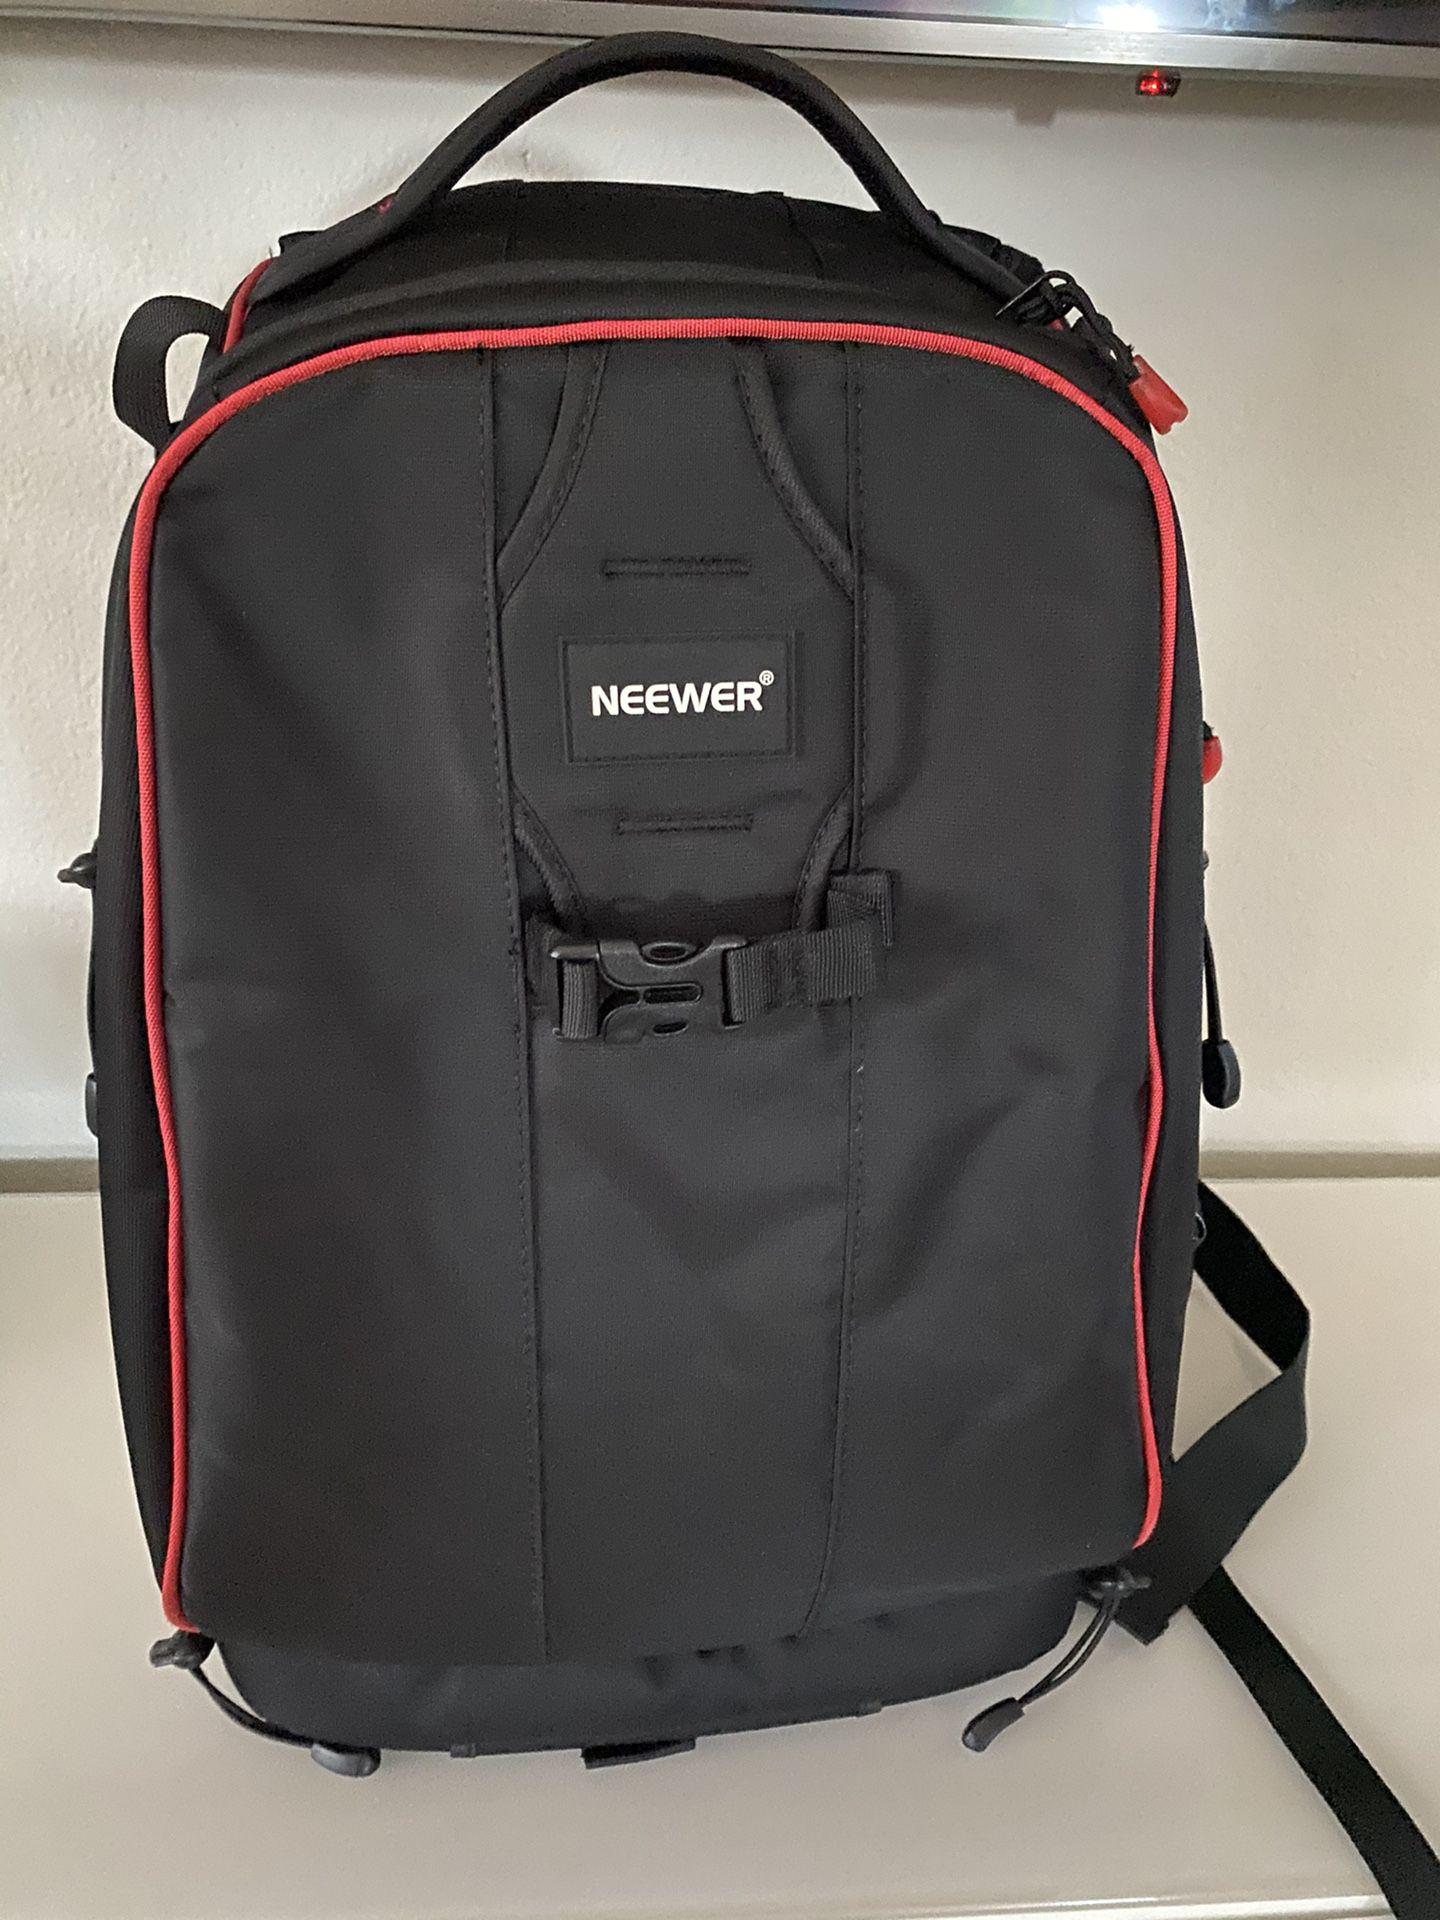 DSLR camera backpack Neewer